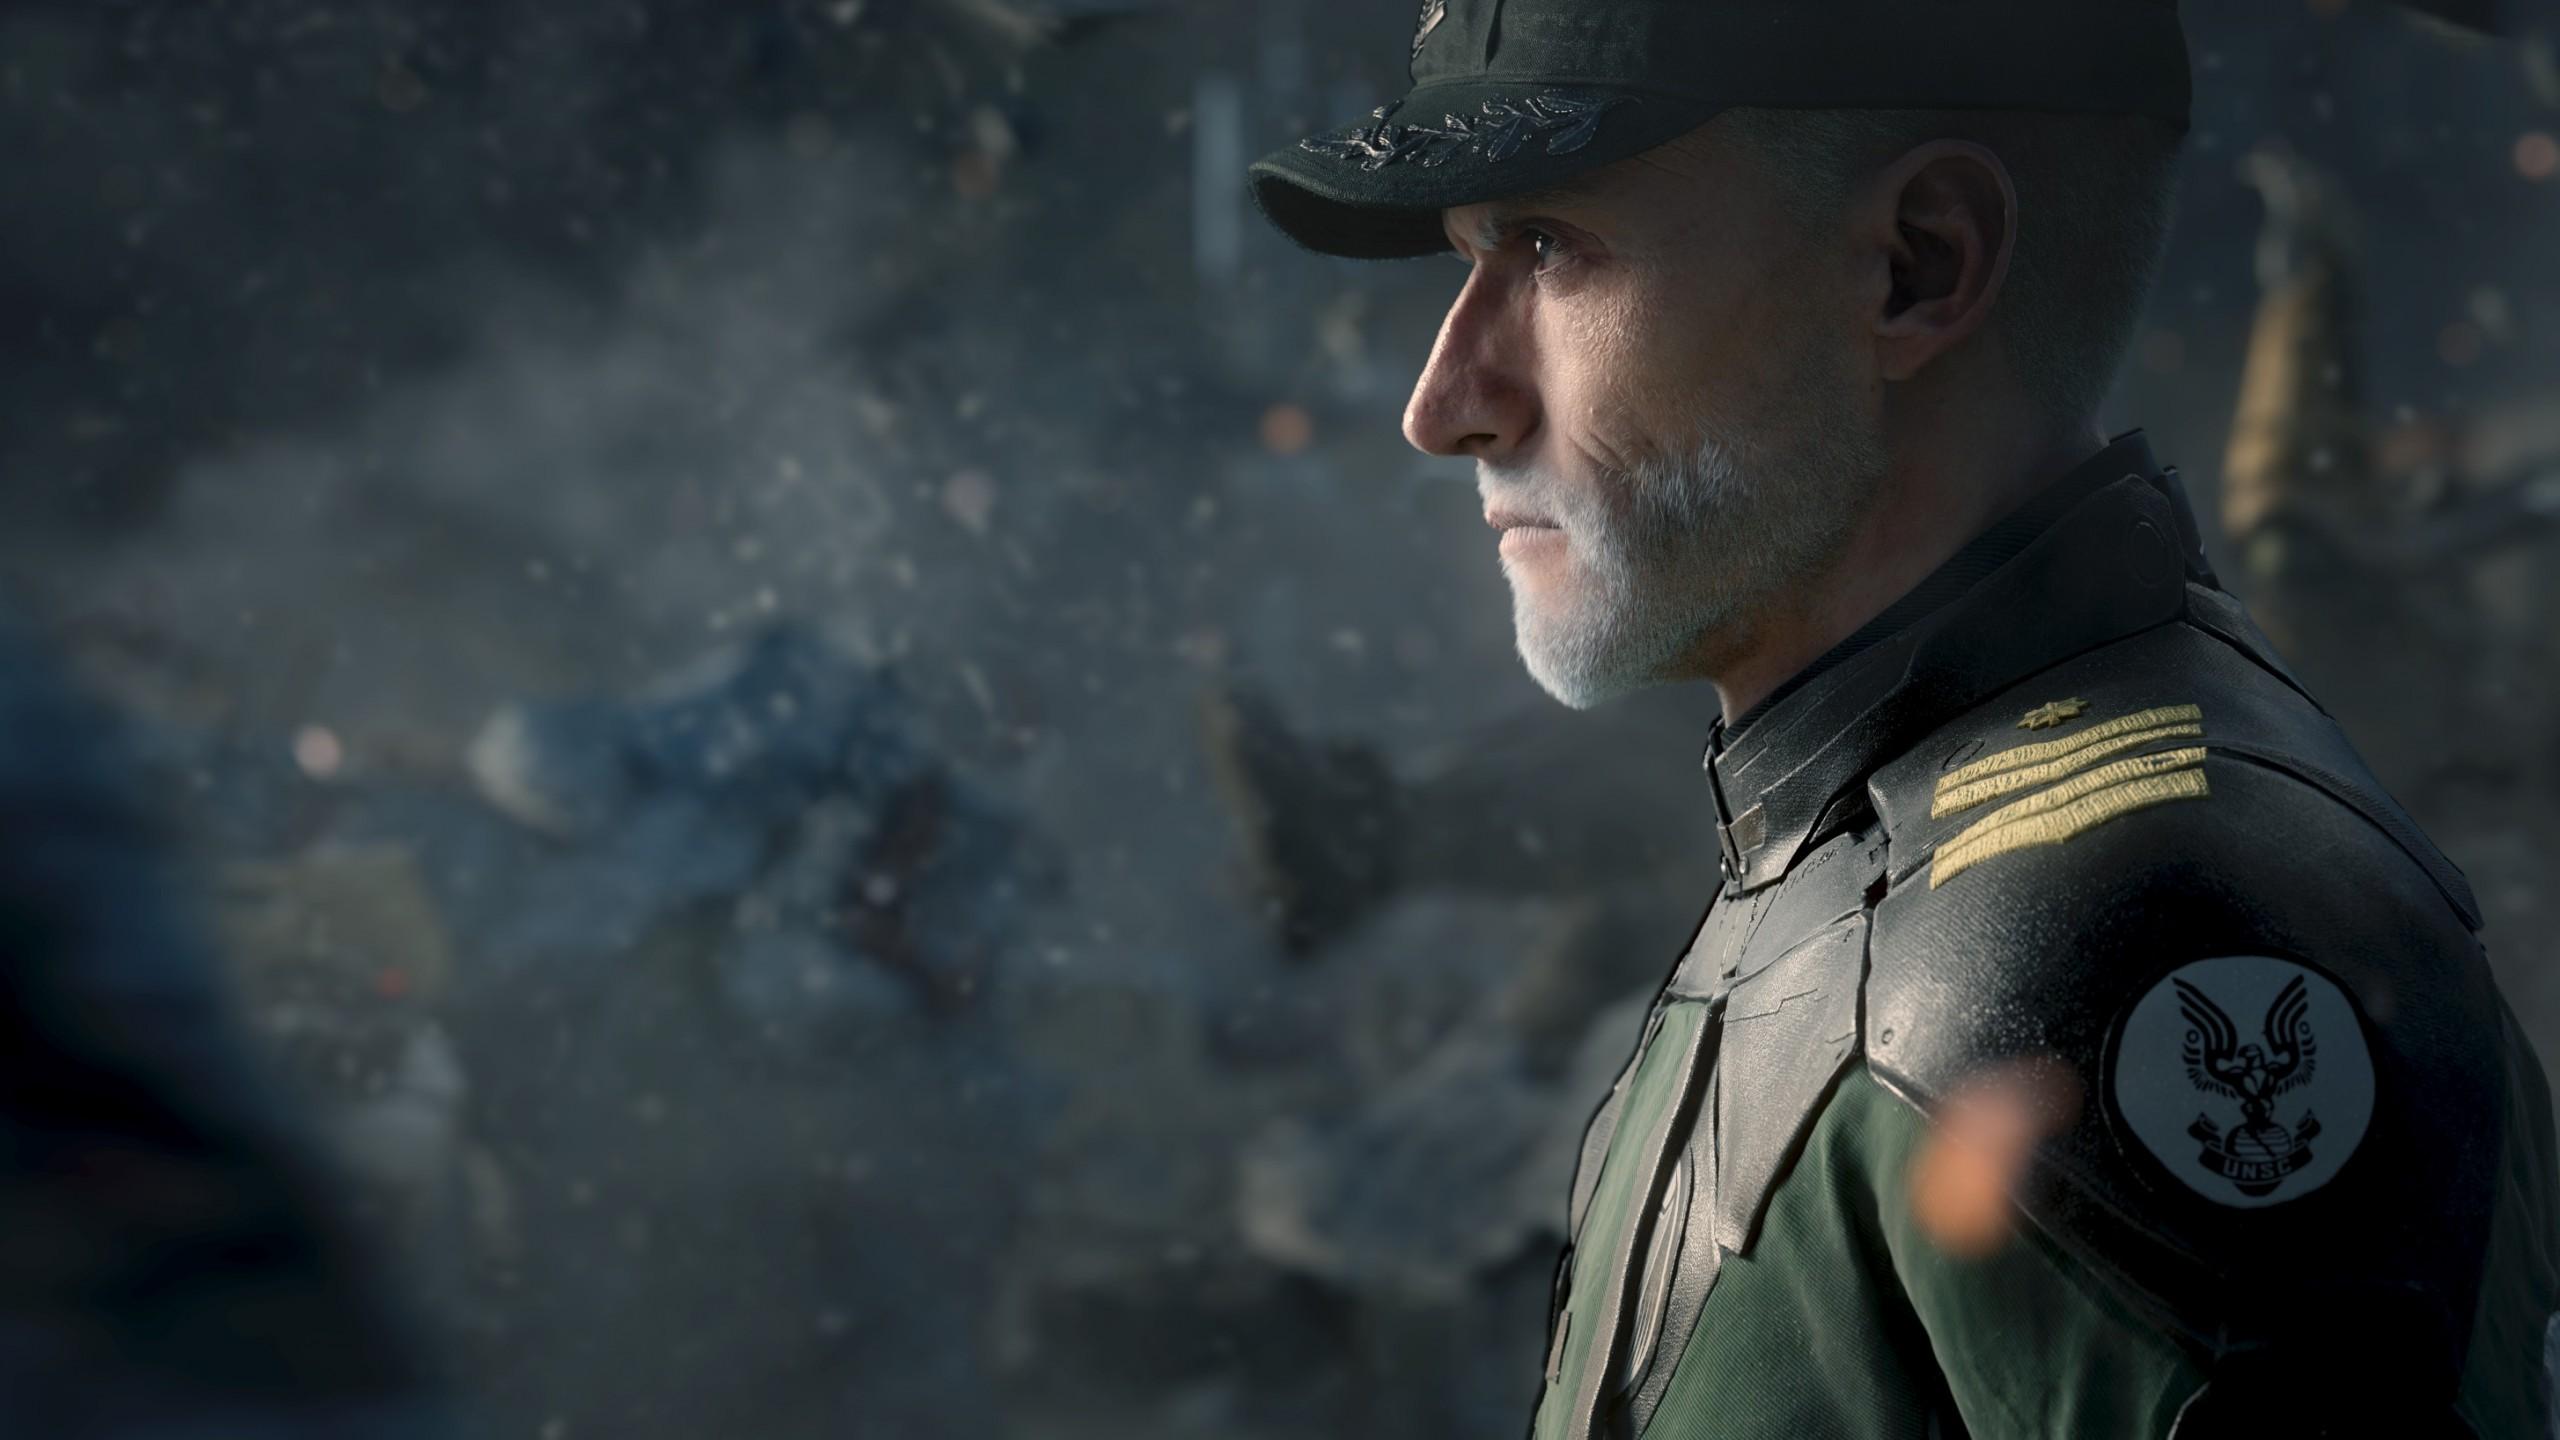 Wallpaper Halo Wars 2 Xbox One Best Games 12921